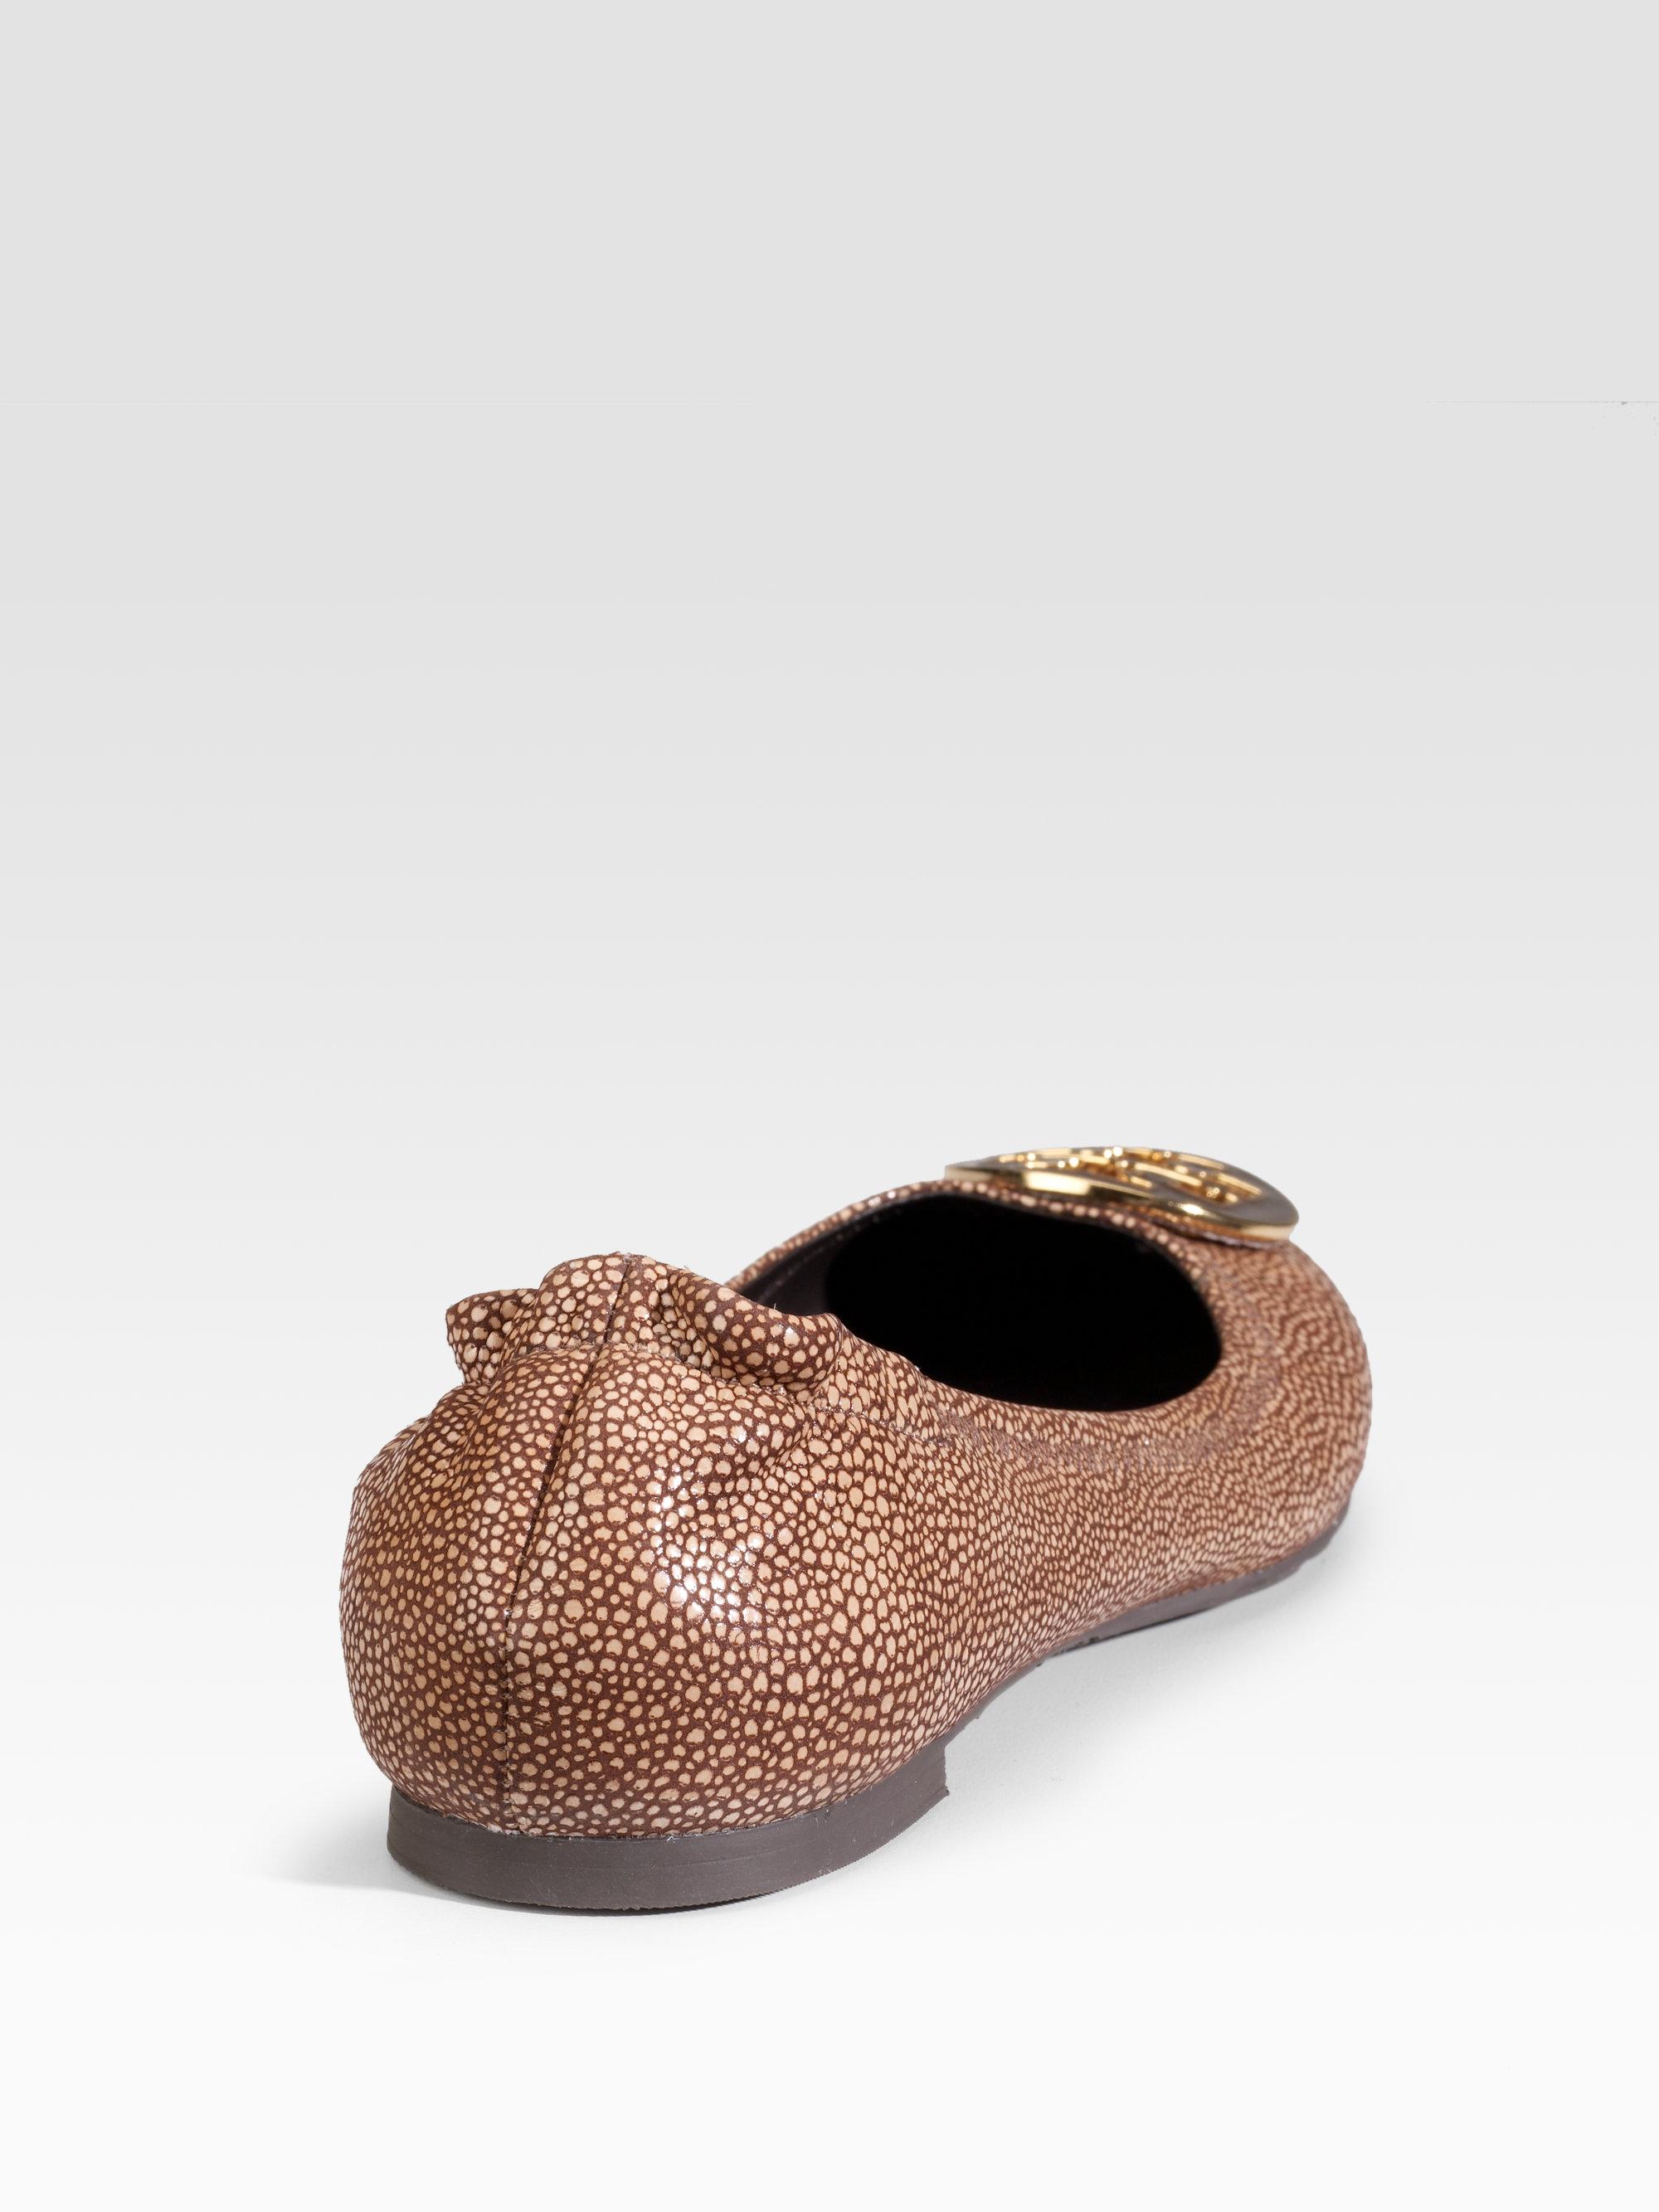 1e79210fdd6 Lyst - Tory Burch Reva Stingray Leather Ballet Flats in Brown